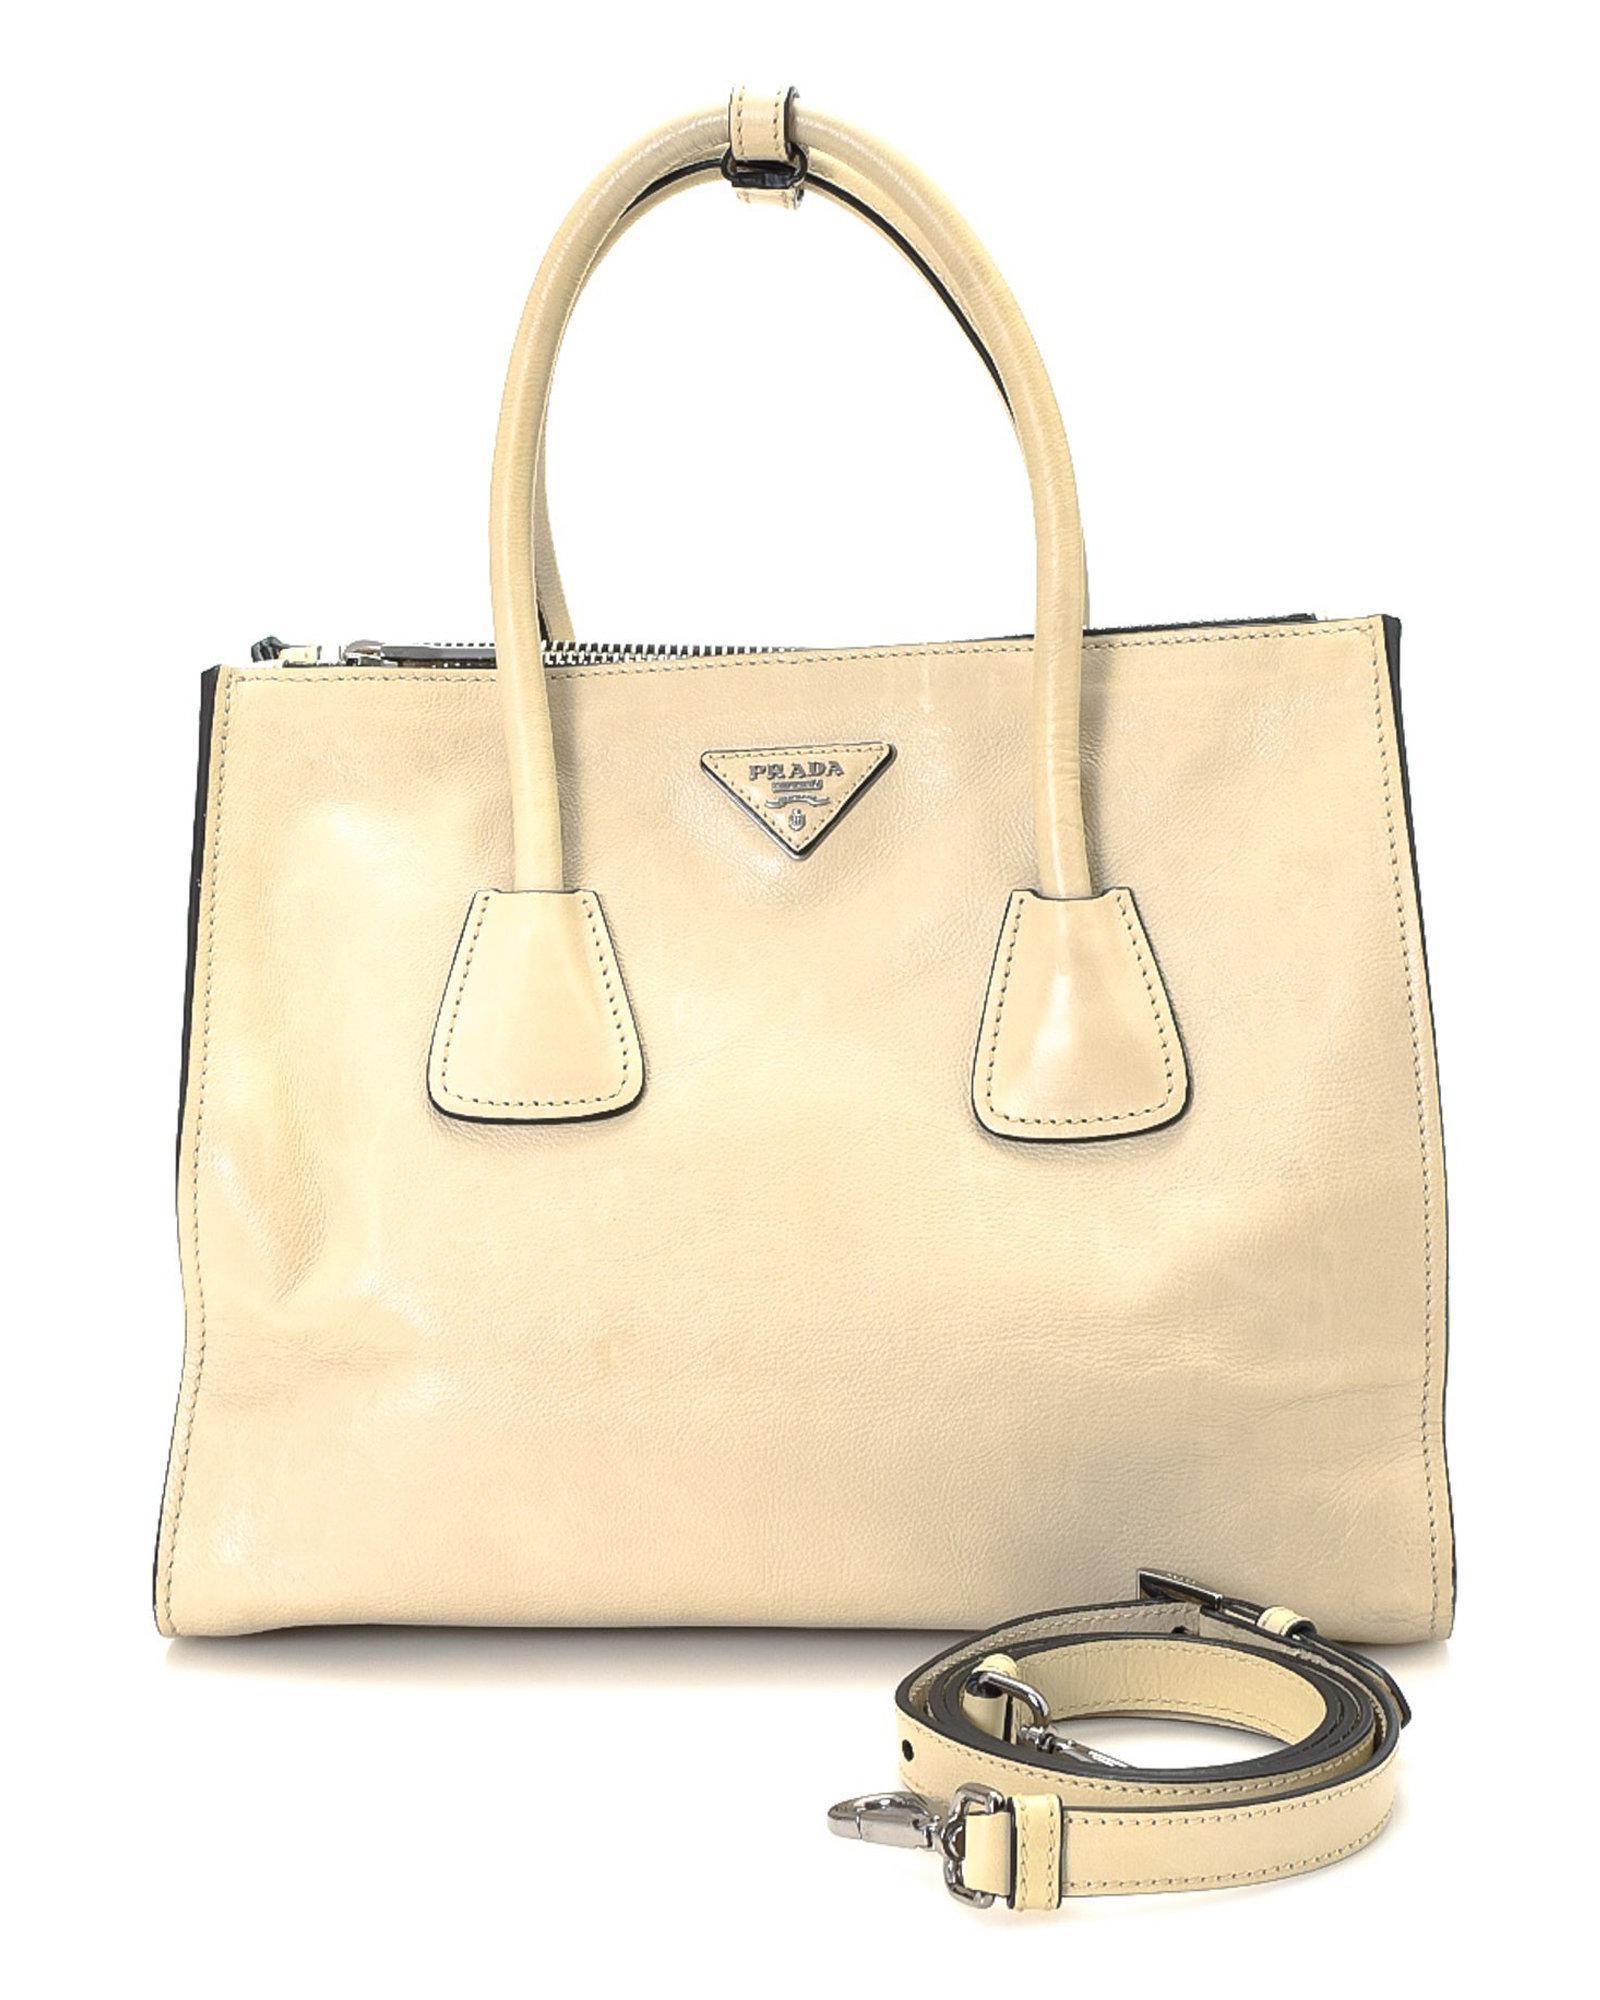 b115f7337fb8 Prada Two-way Leather Handbag - Vintage in Natural - Lyst